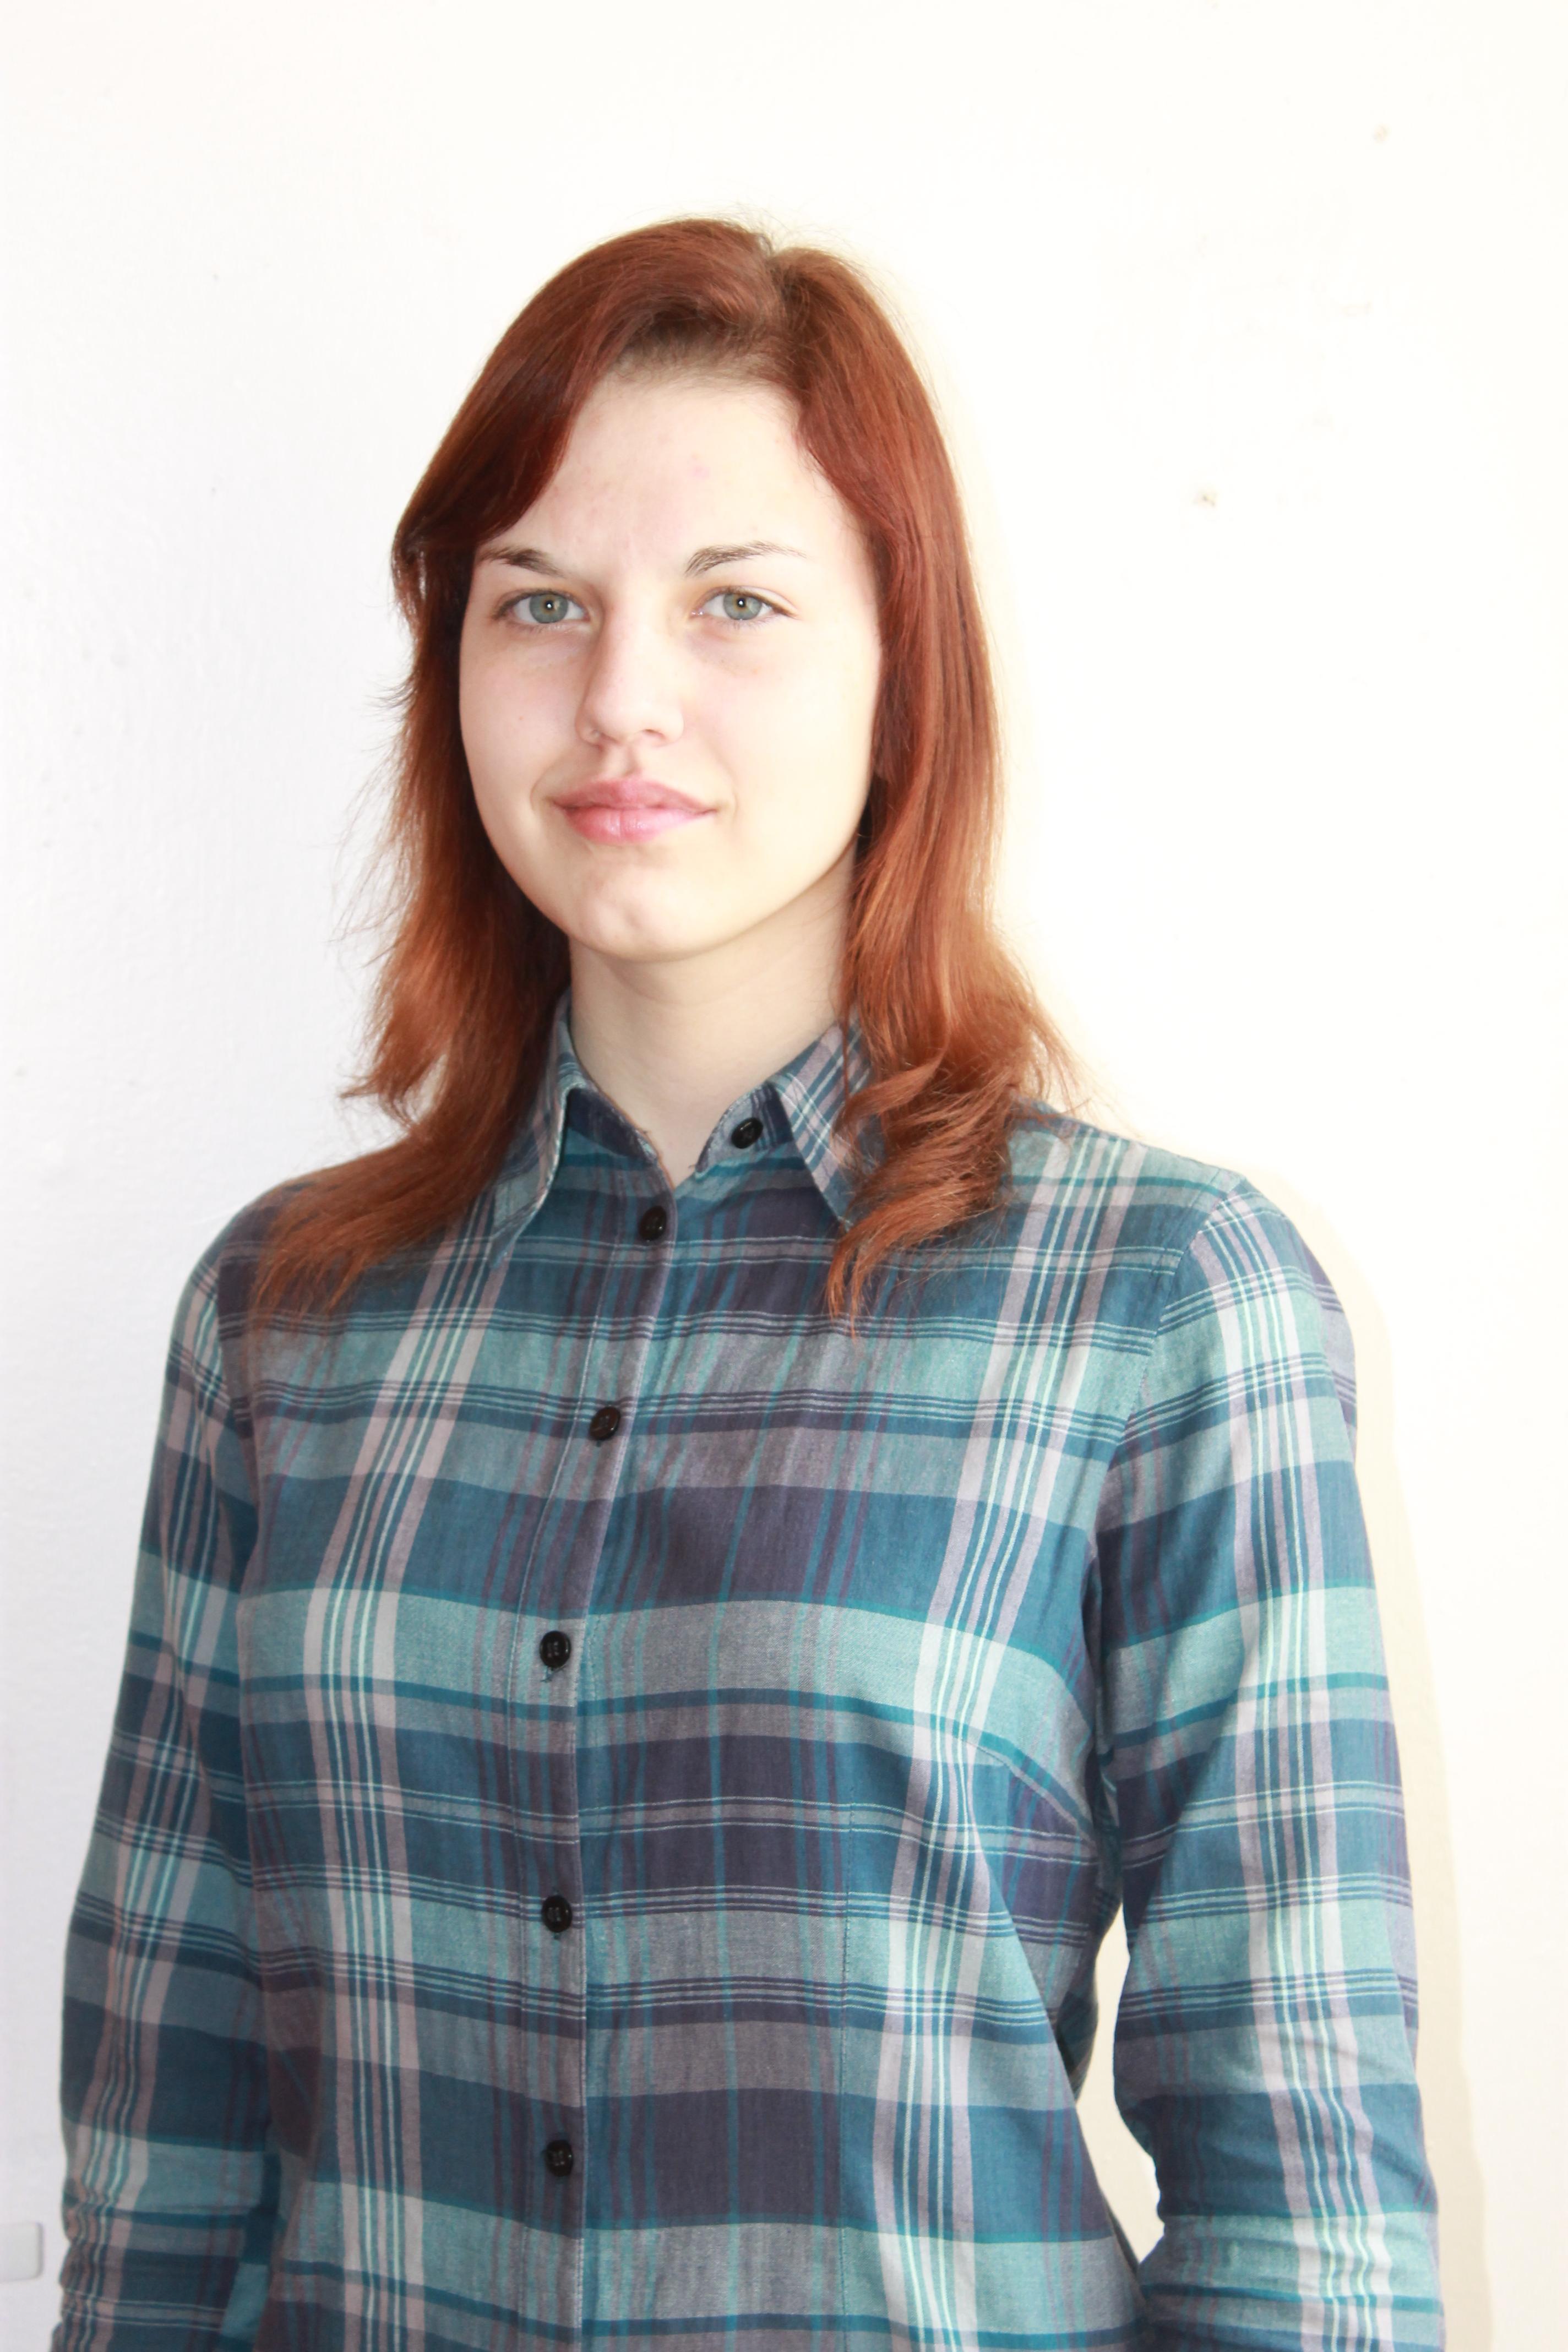 №2. Татьяна Васильева, 16 лет. Солецкий район.